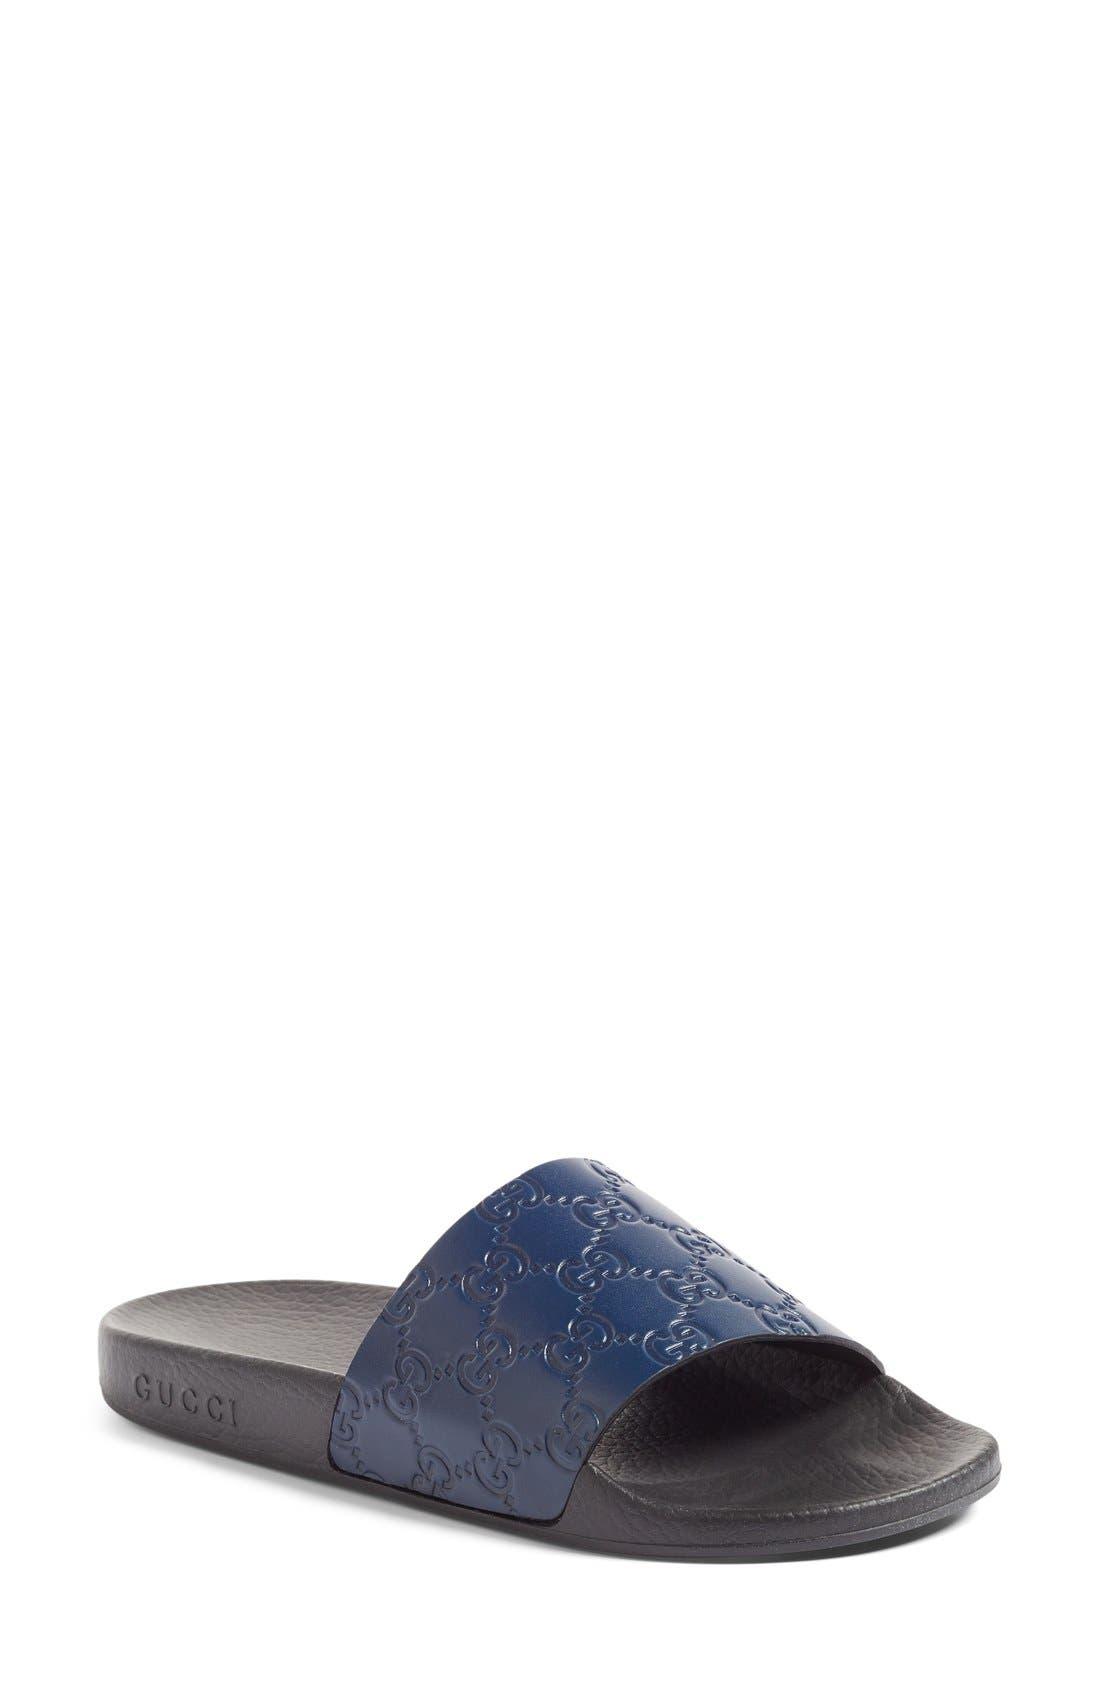 Alternate Image 1 Selected - Gucci Pursuit Logo Slide Sandal (Women)